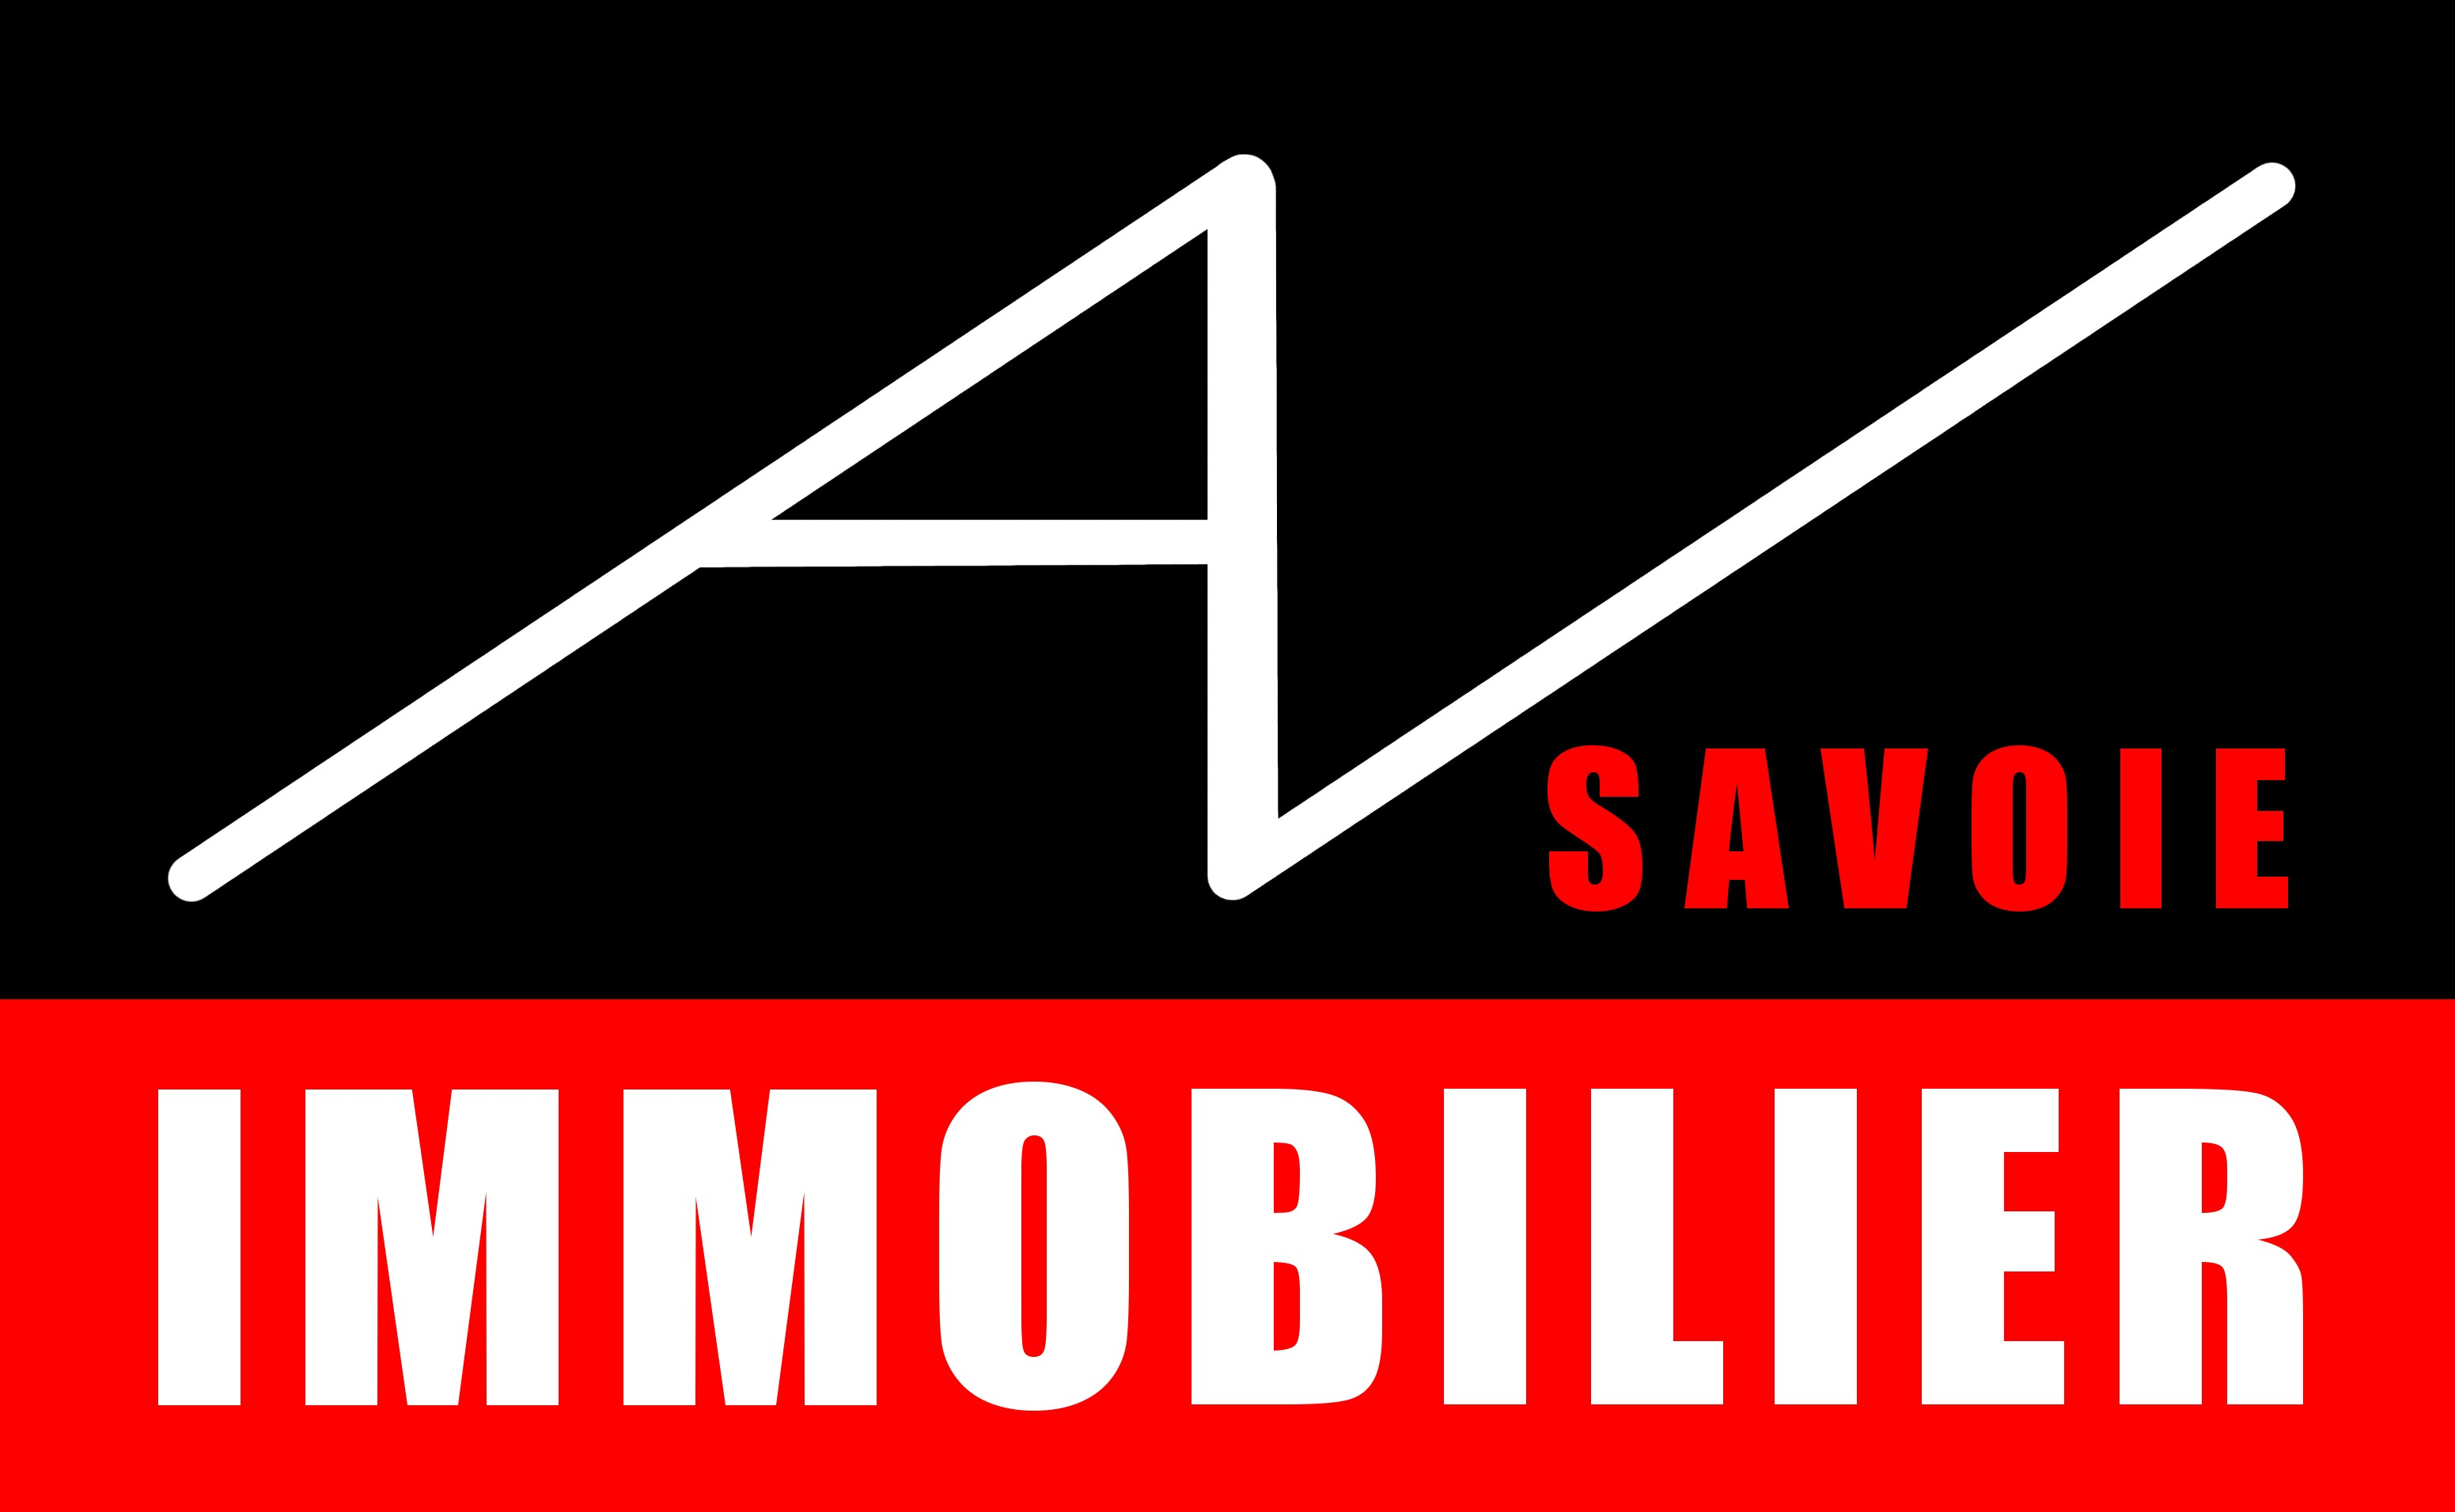 AV SAVOIE agence immobilière Chambéry 73000